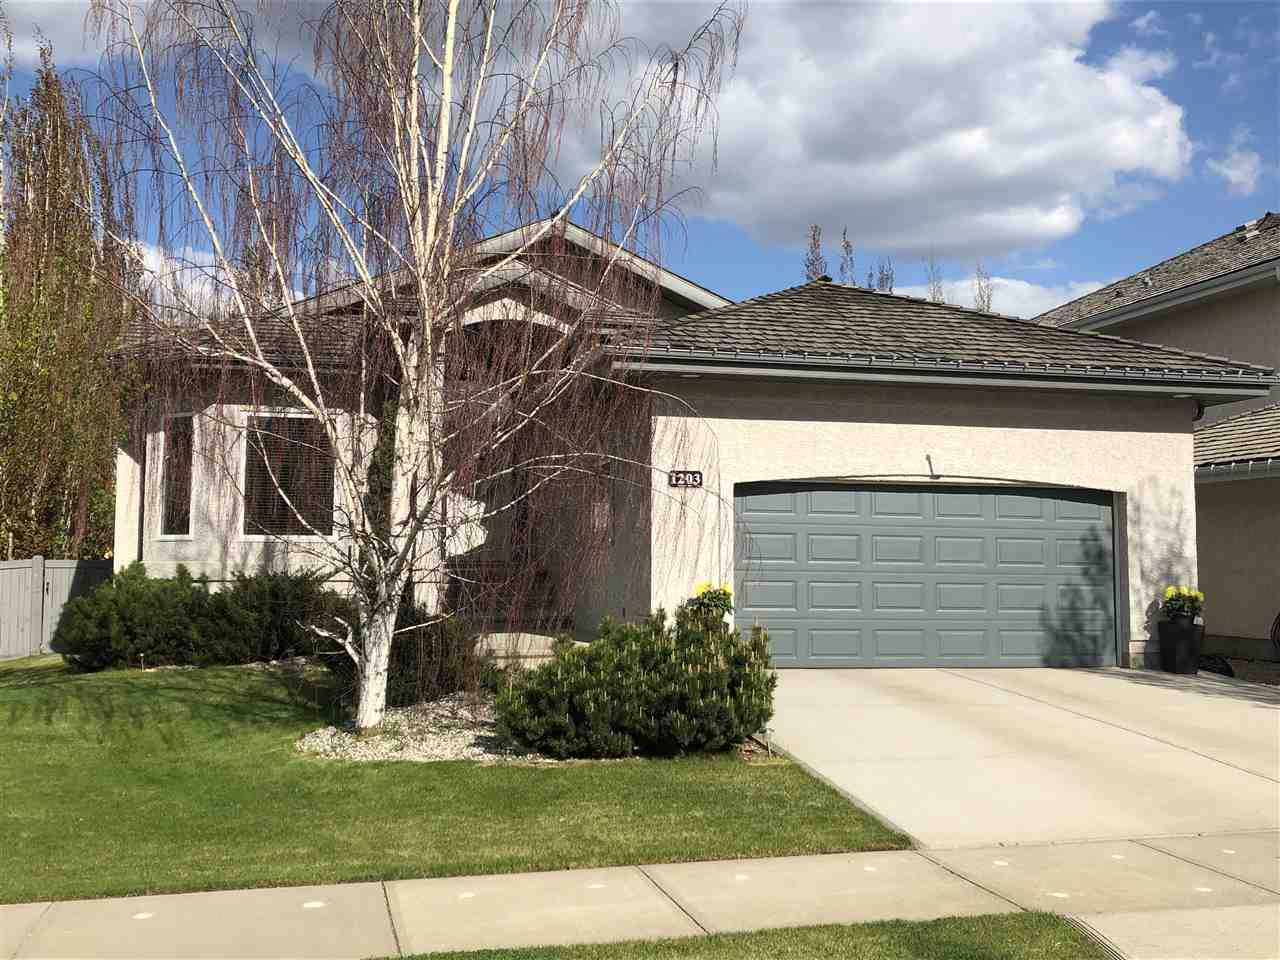 Main Photo: 1203 DECKER Way in Edmonton: Zone 20 House for sale : MLS®# E4149059